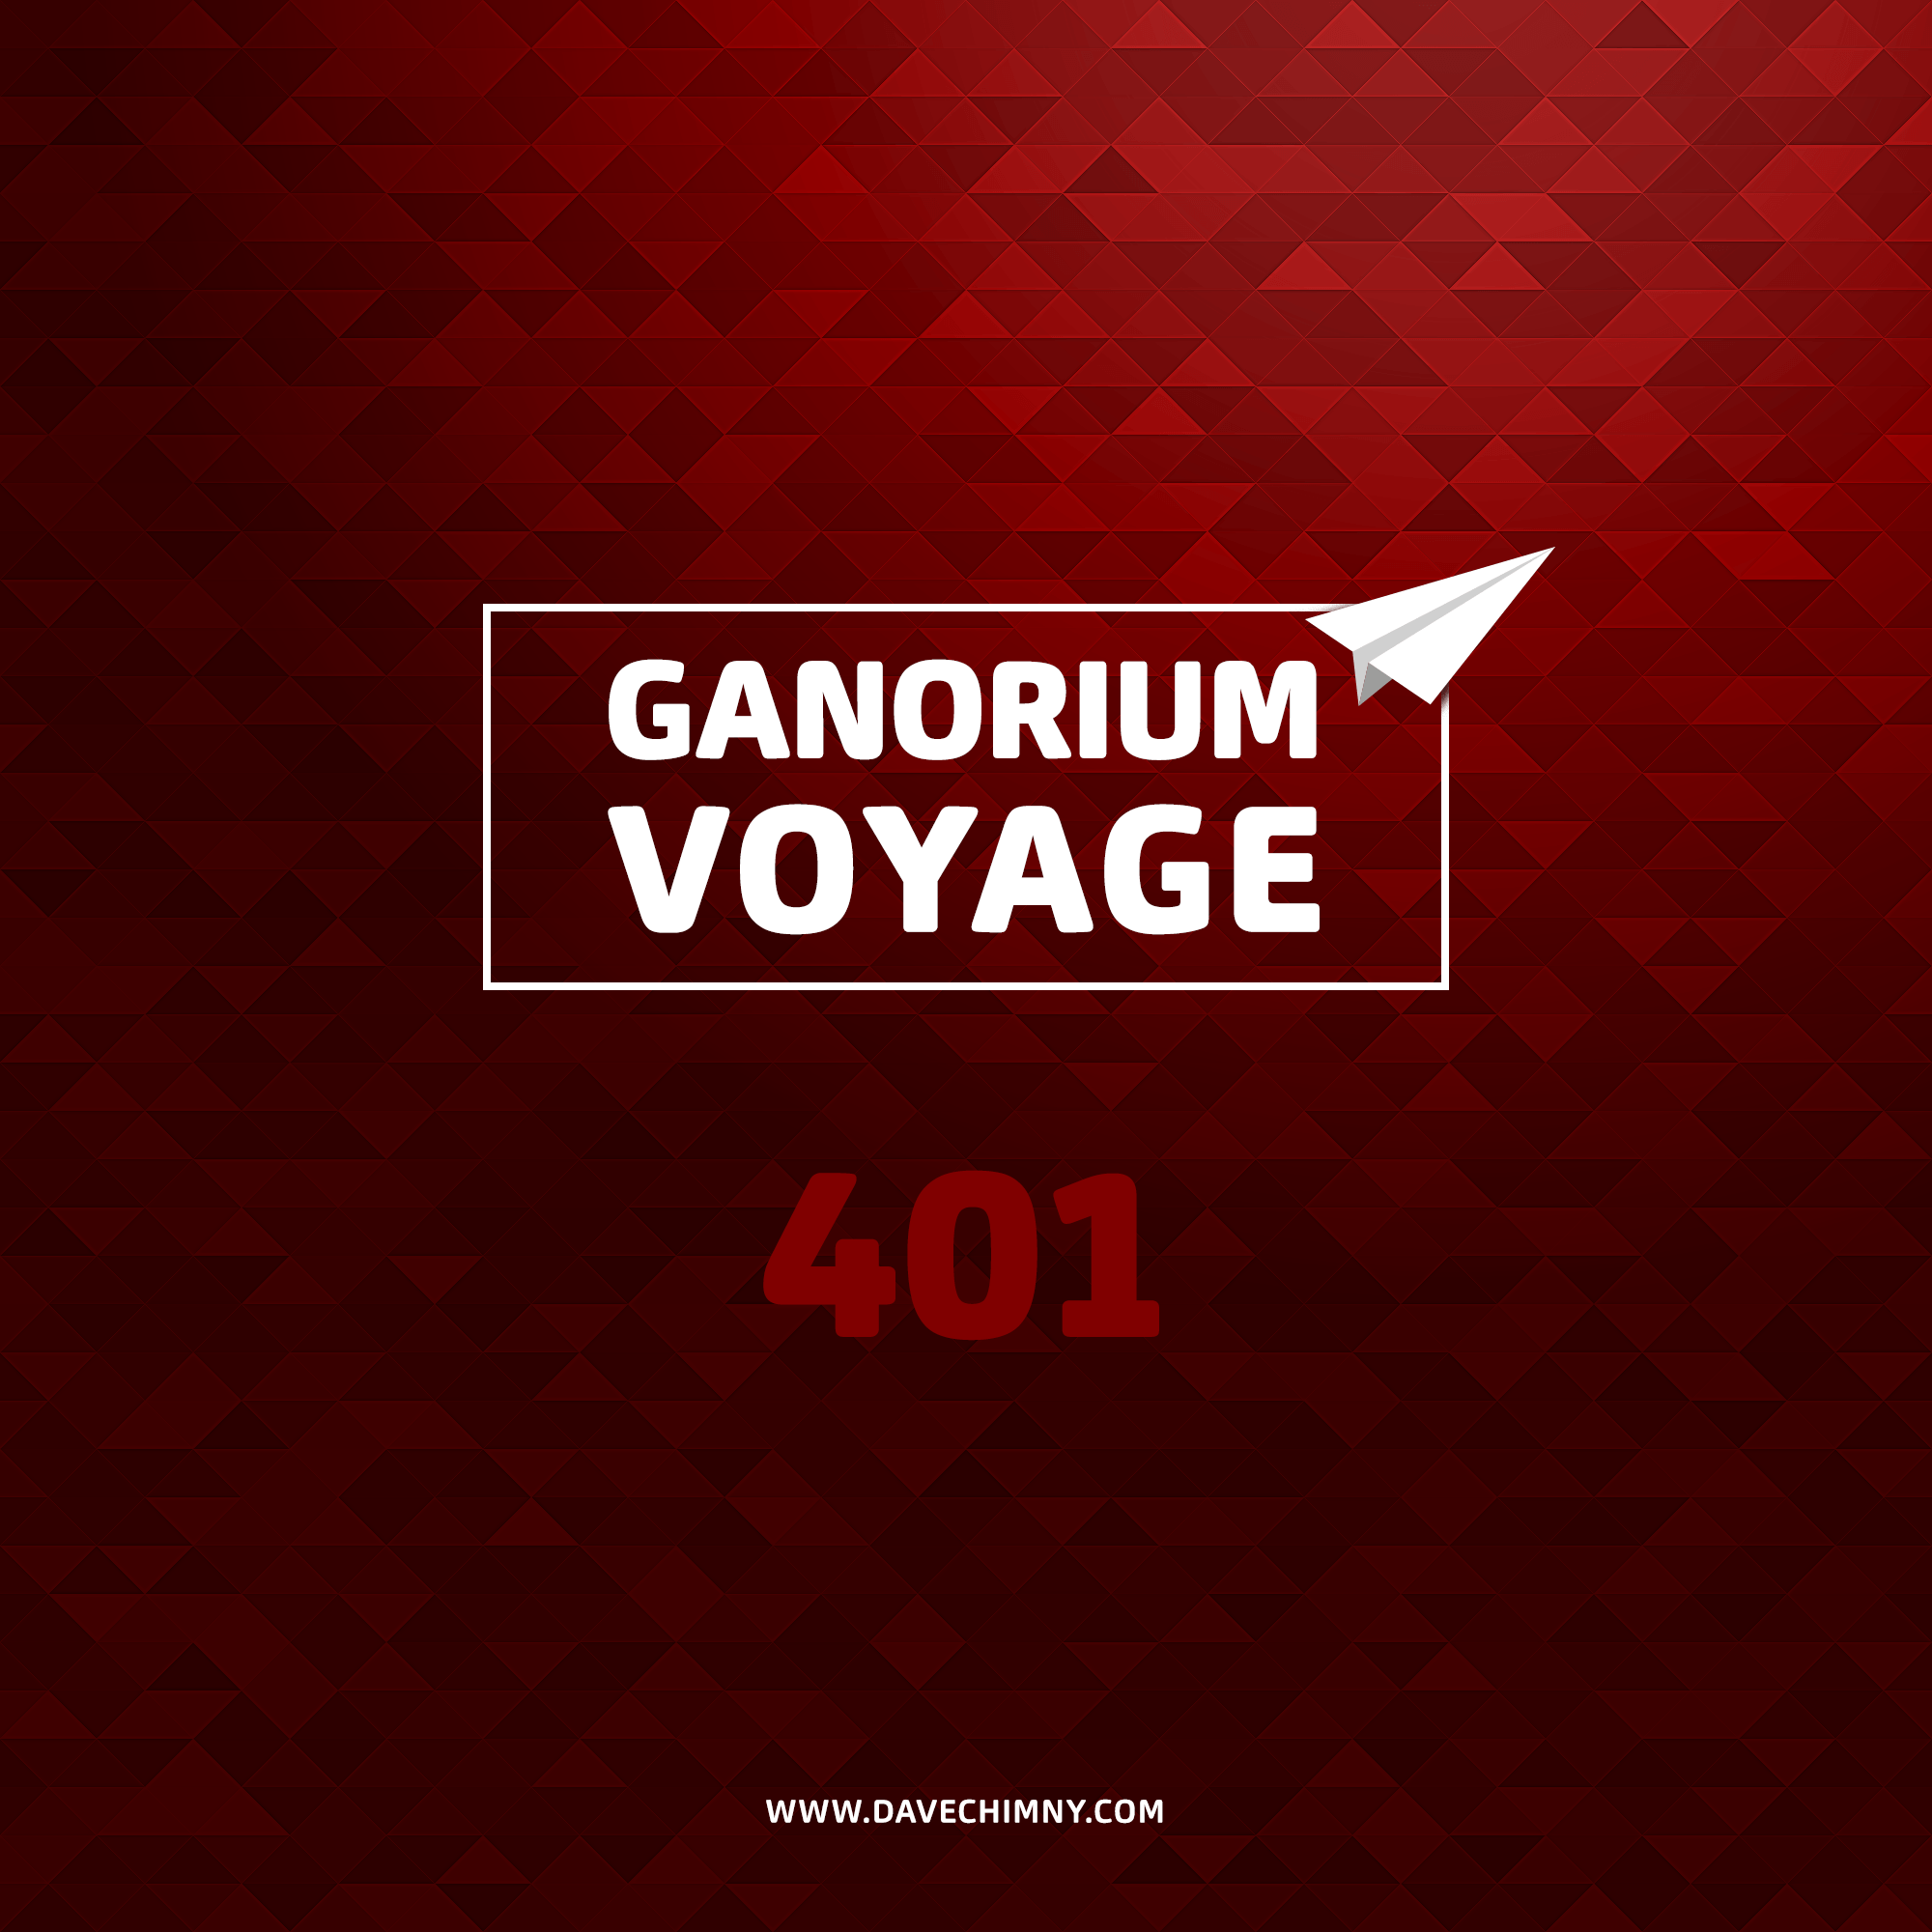 Dave Chimny - Ganorium Voyage 401